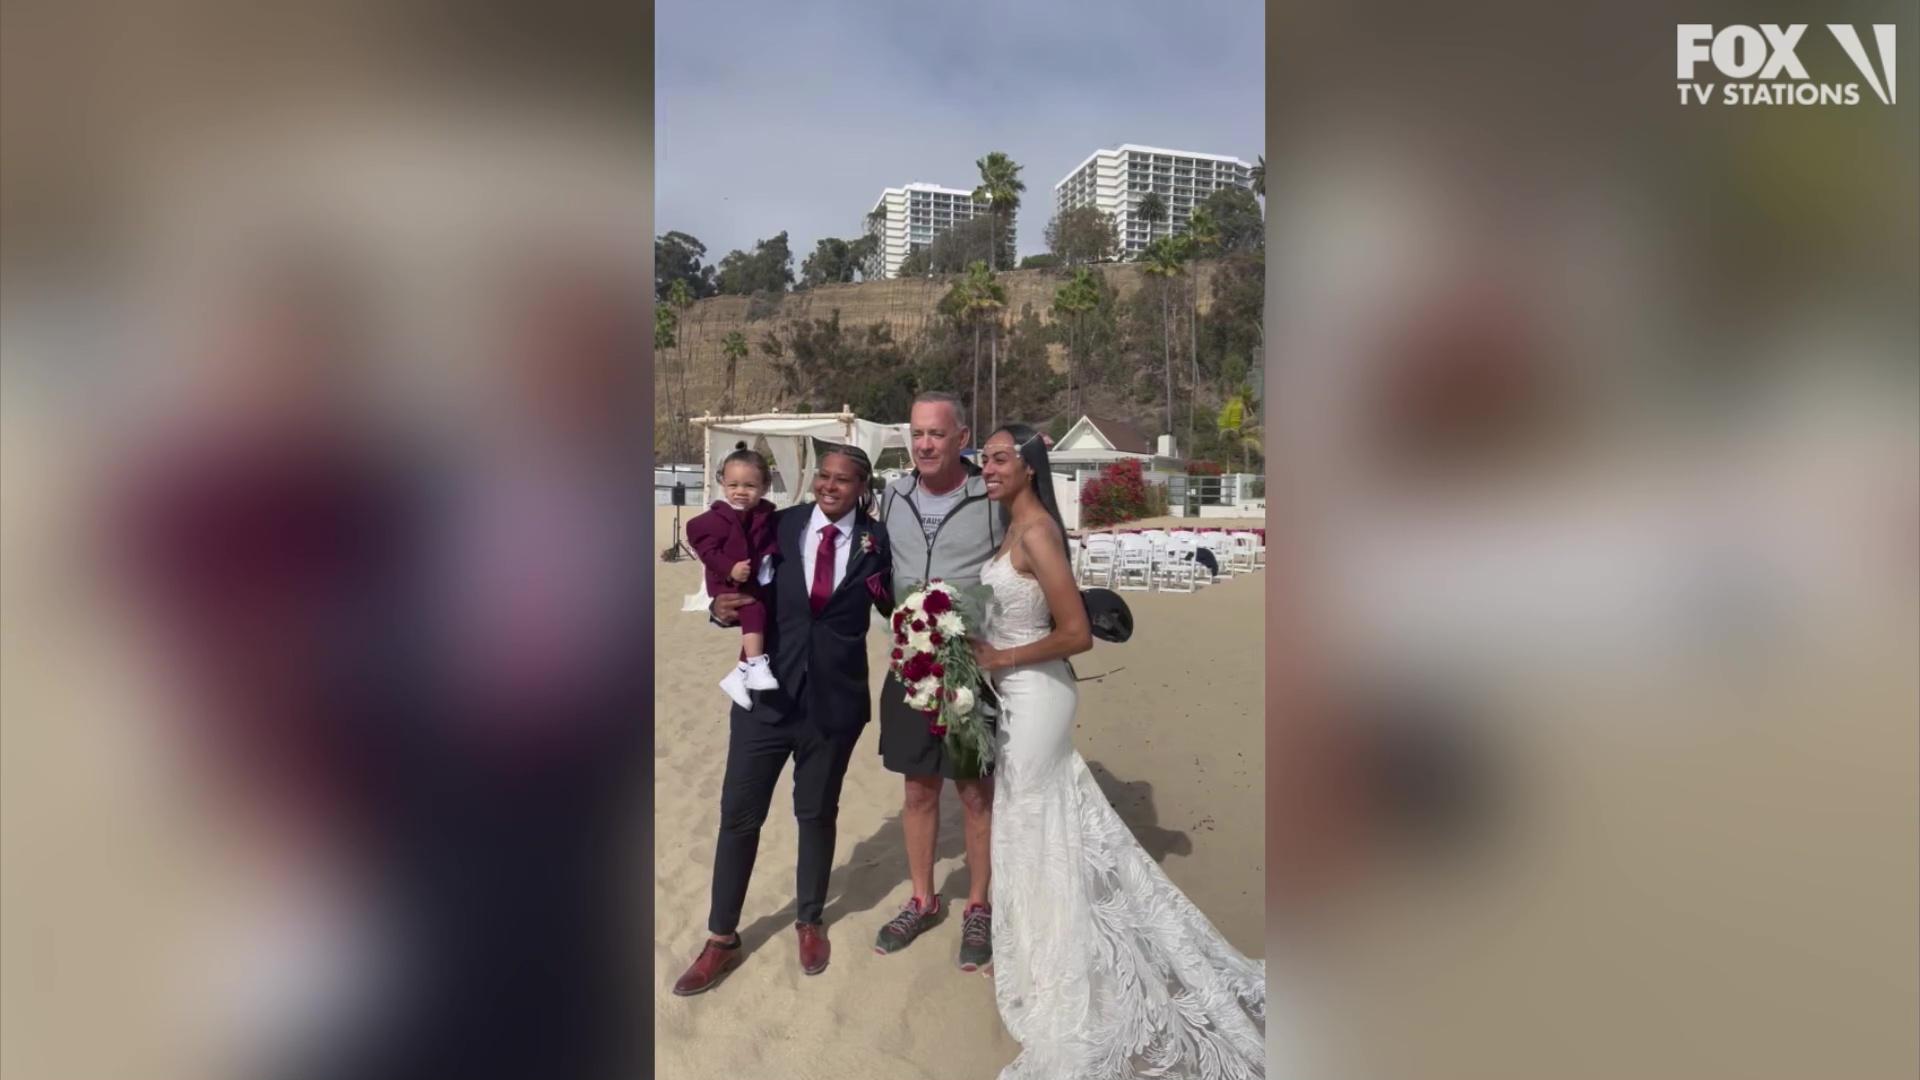 Tom Hanks crashes wedding in Santa Monica